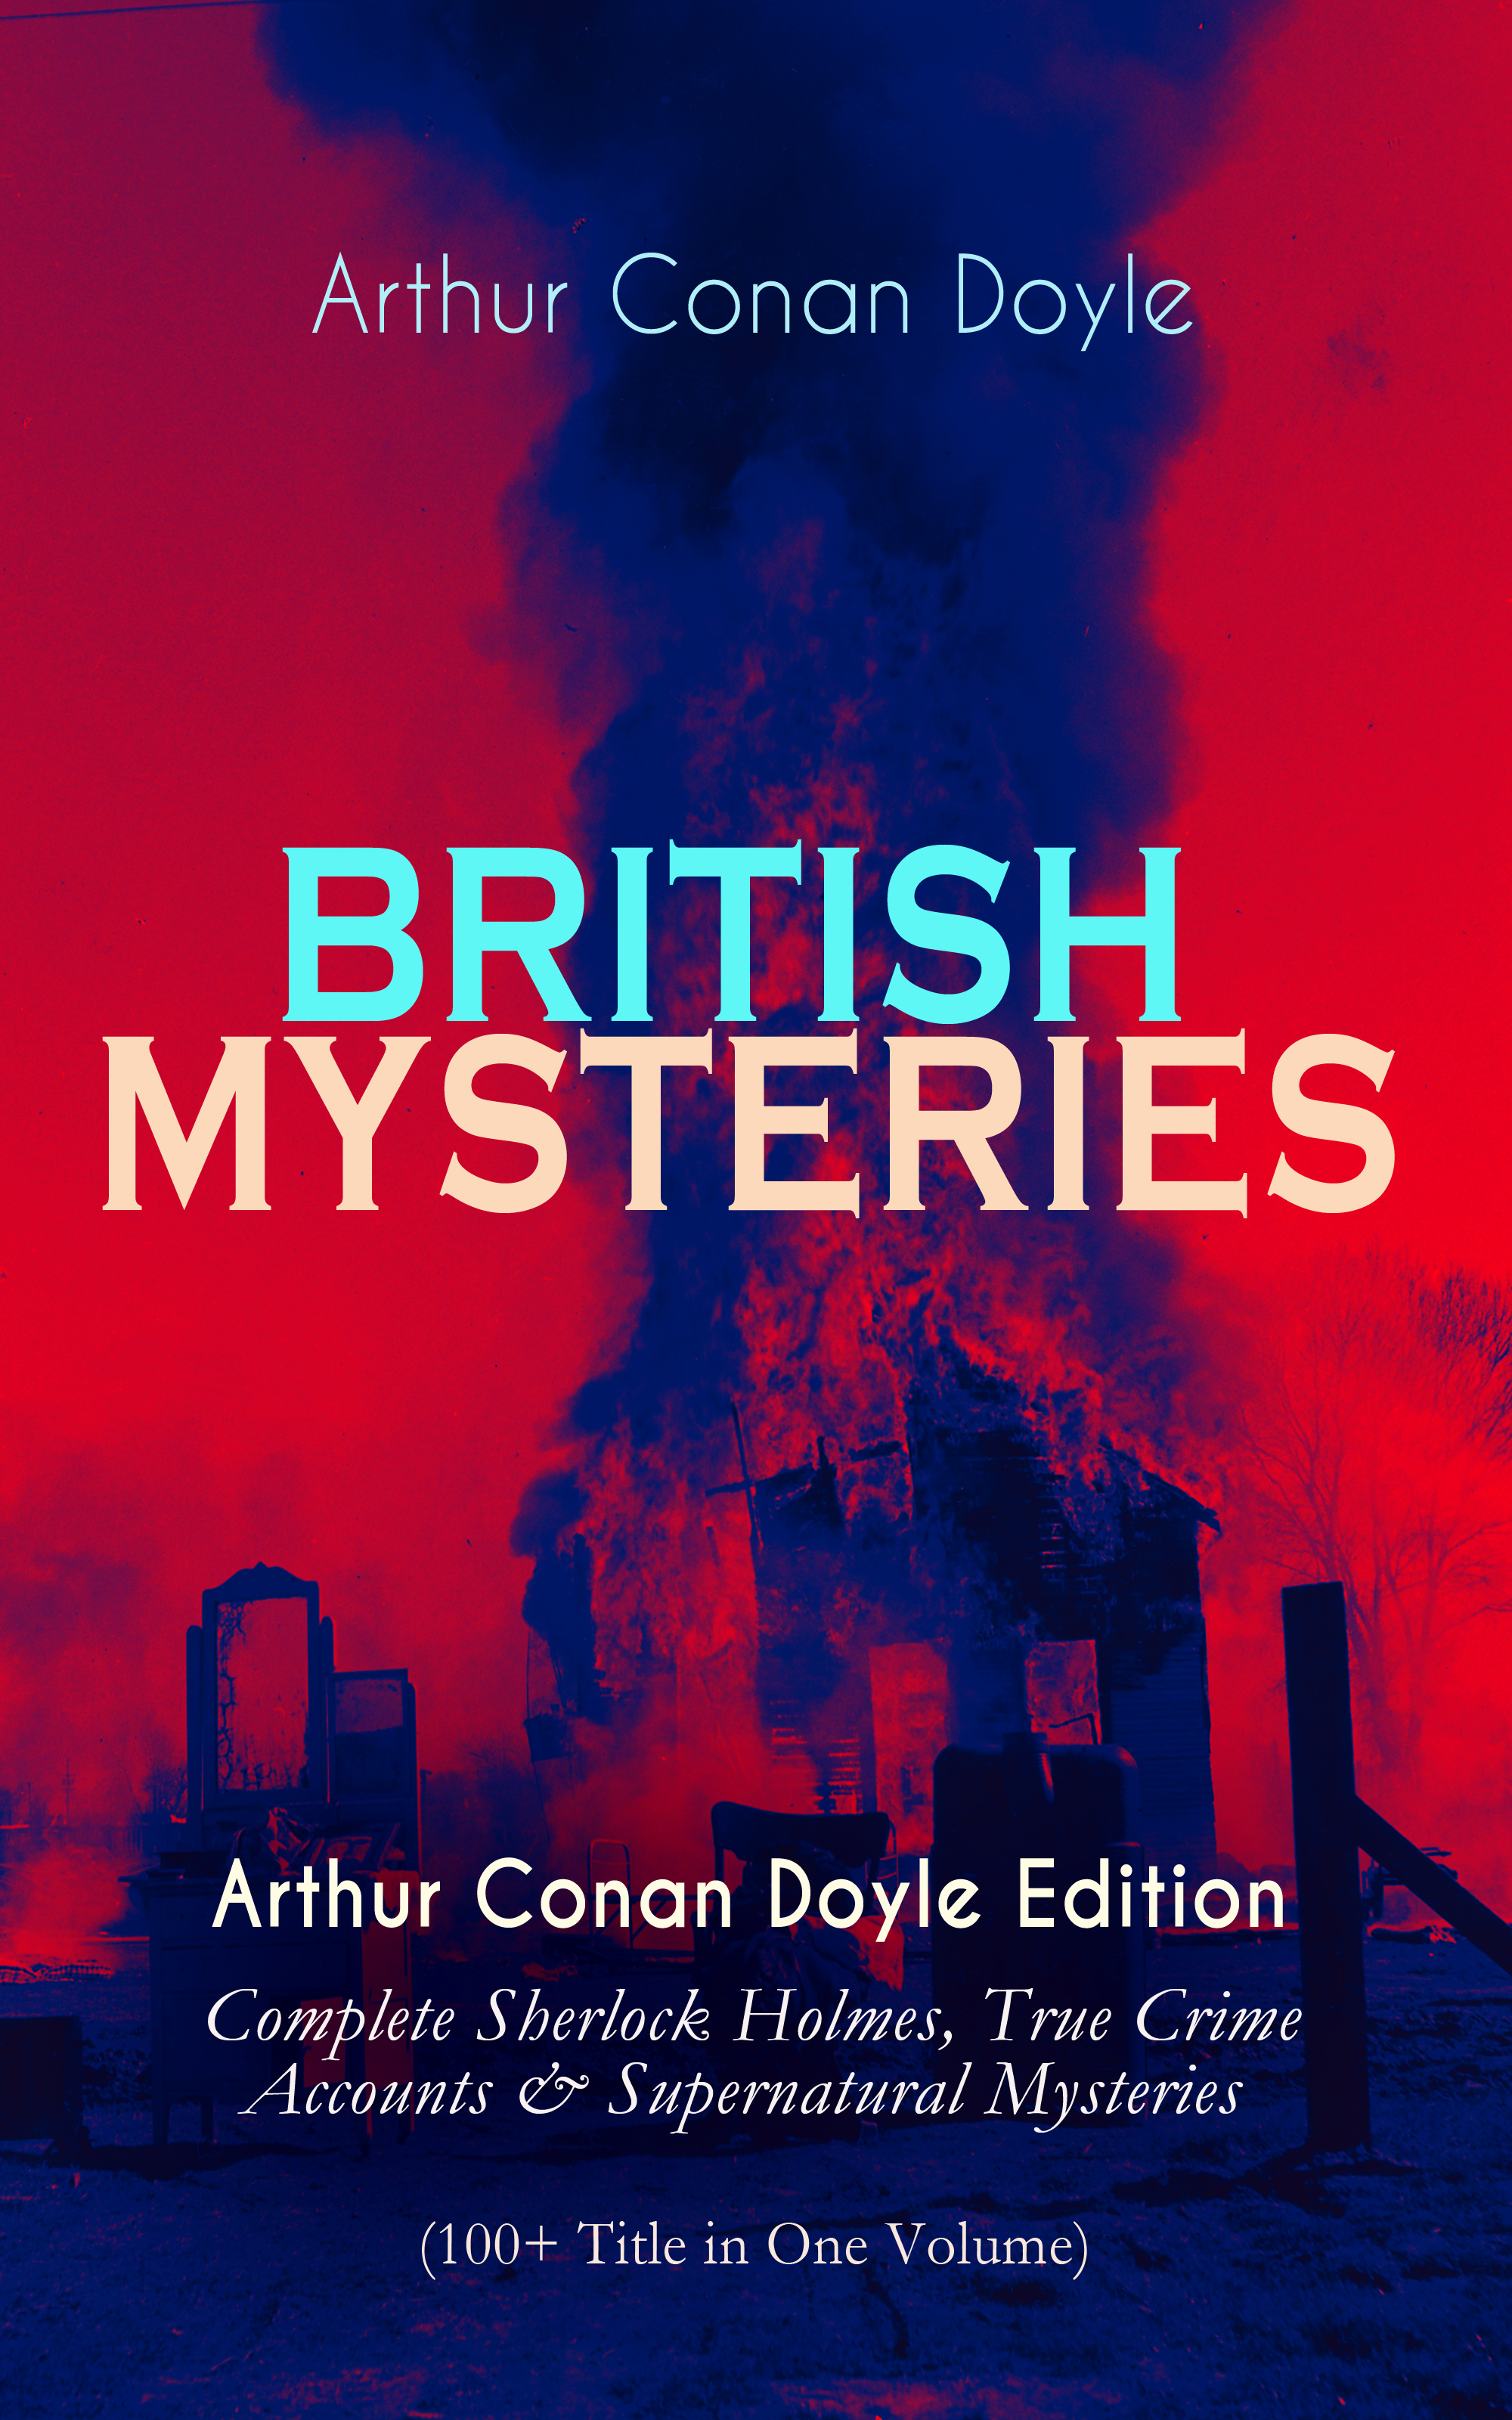 Arthur Conan Doyle BRITISH MYSTERIES - Arthur Conan Doyle Edition arthur conan doyle the parasite